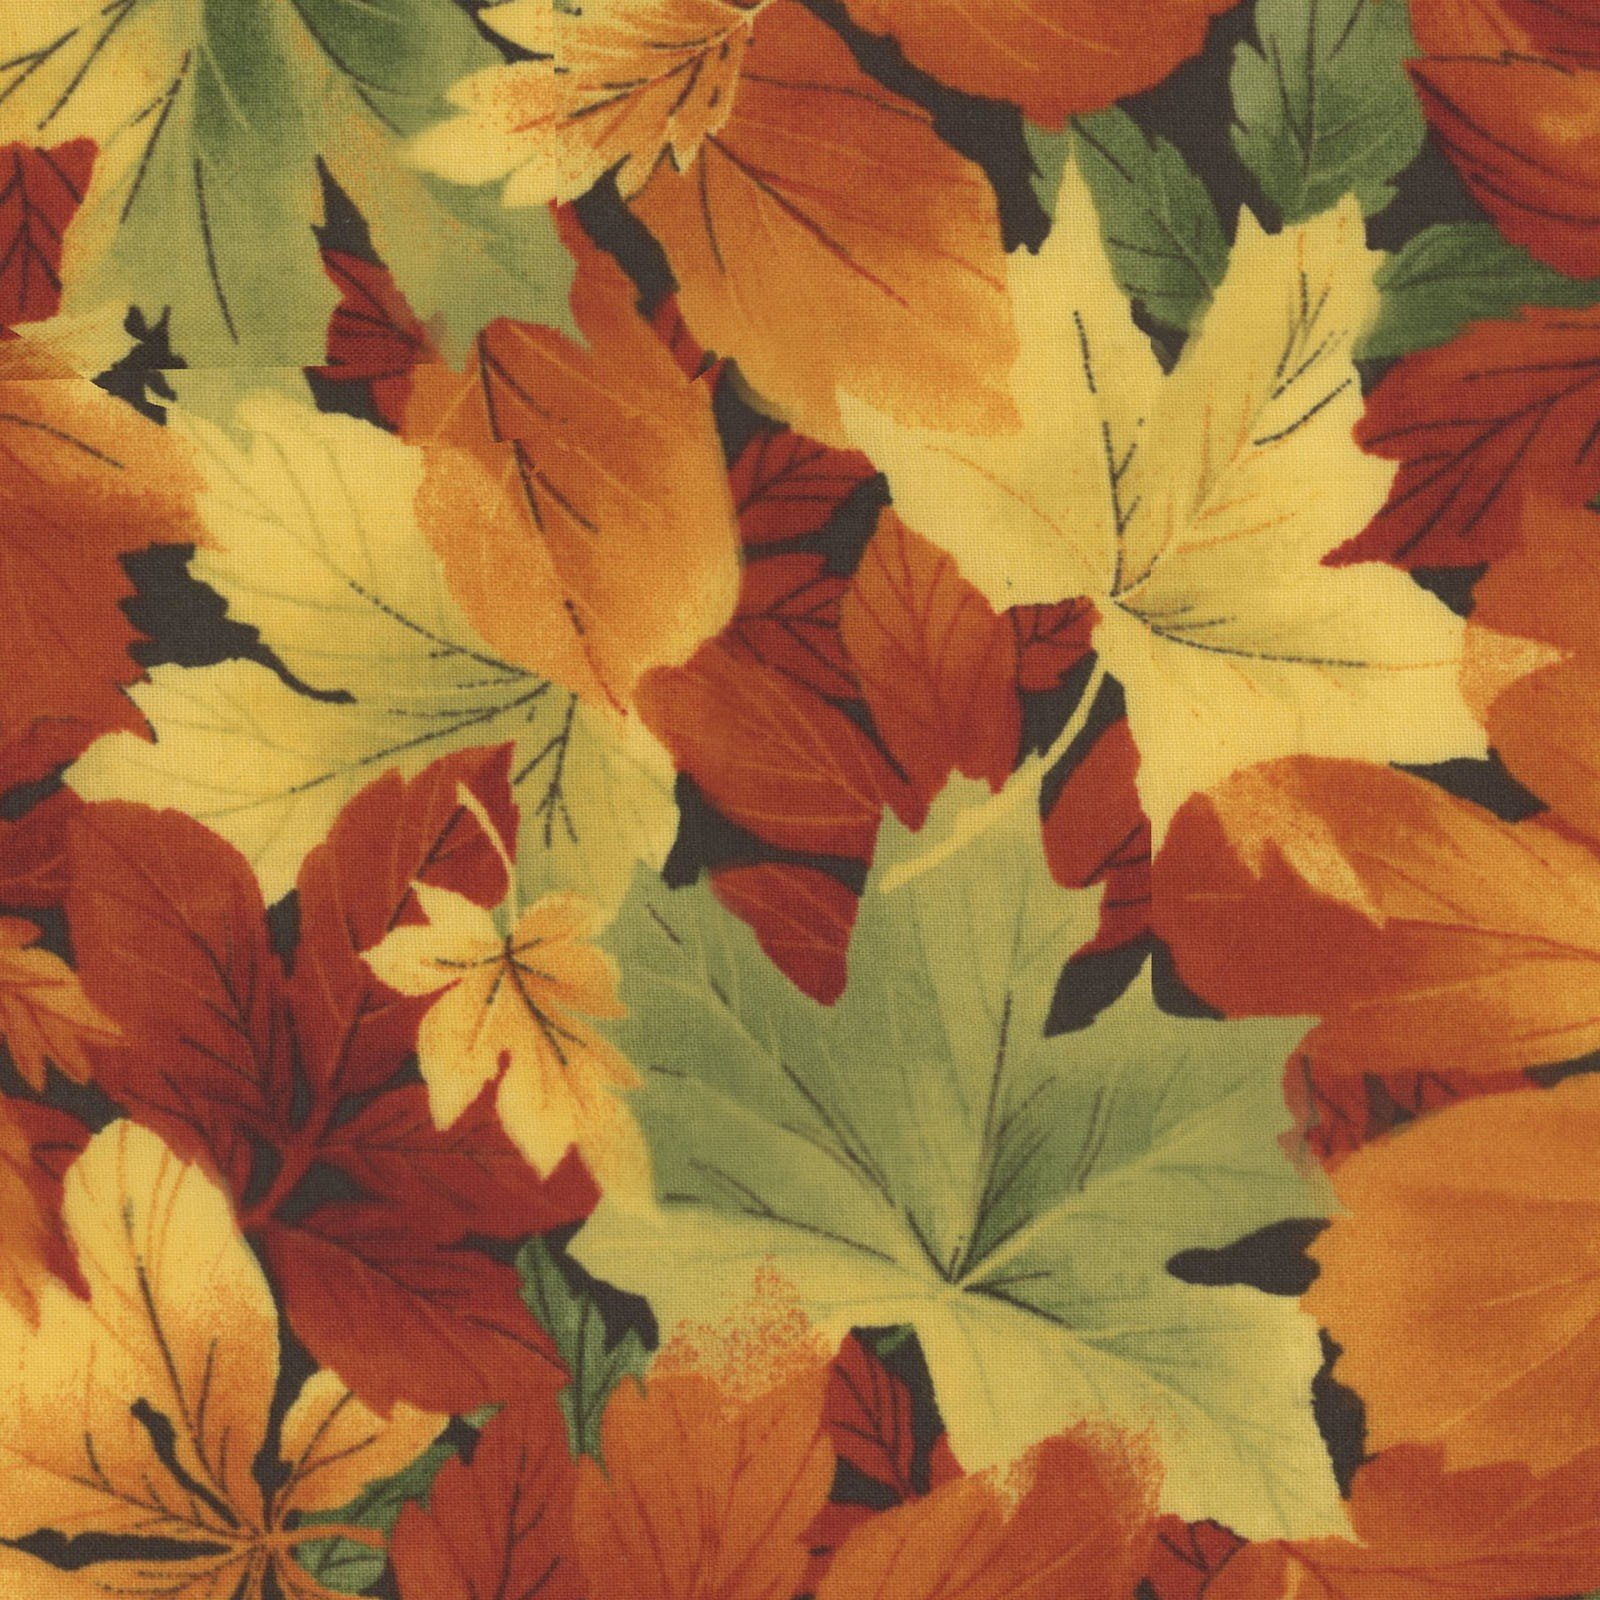 Falling Leaves - Lush Leaves